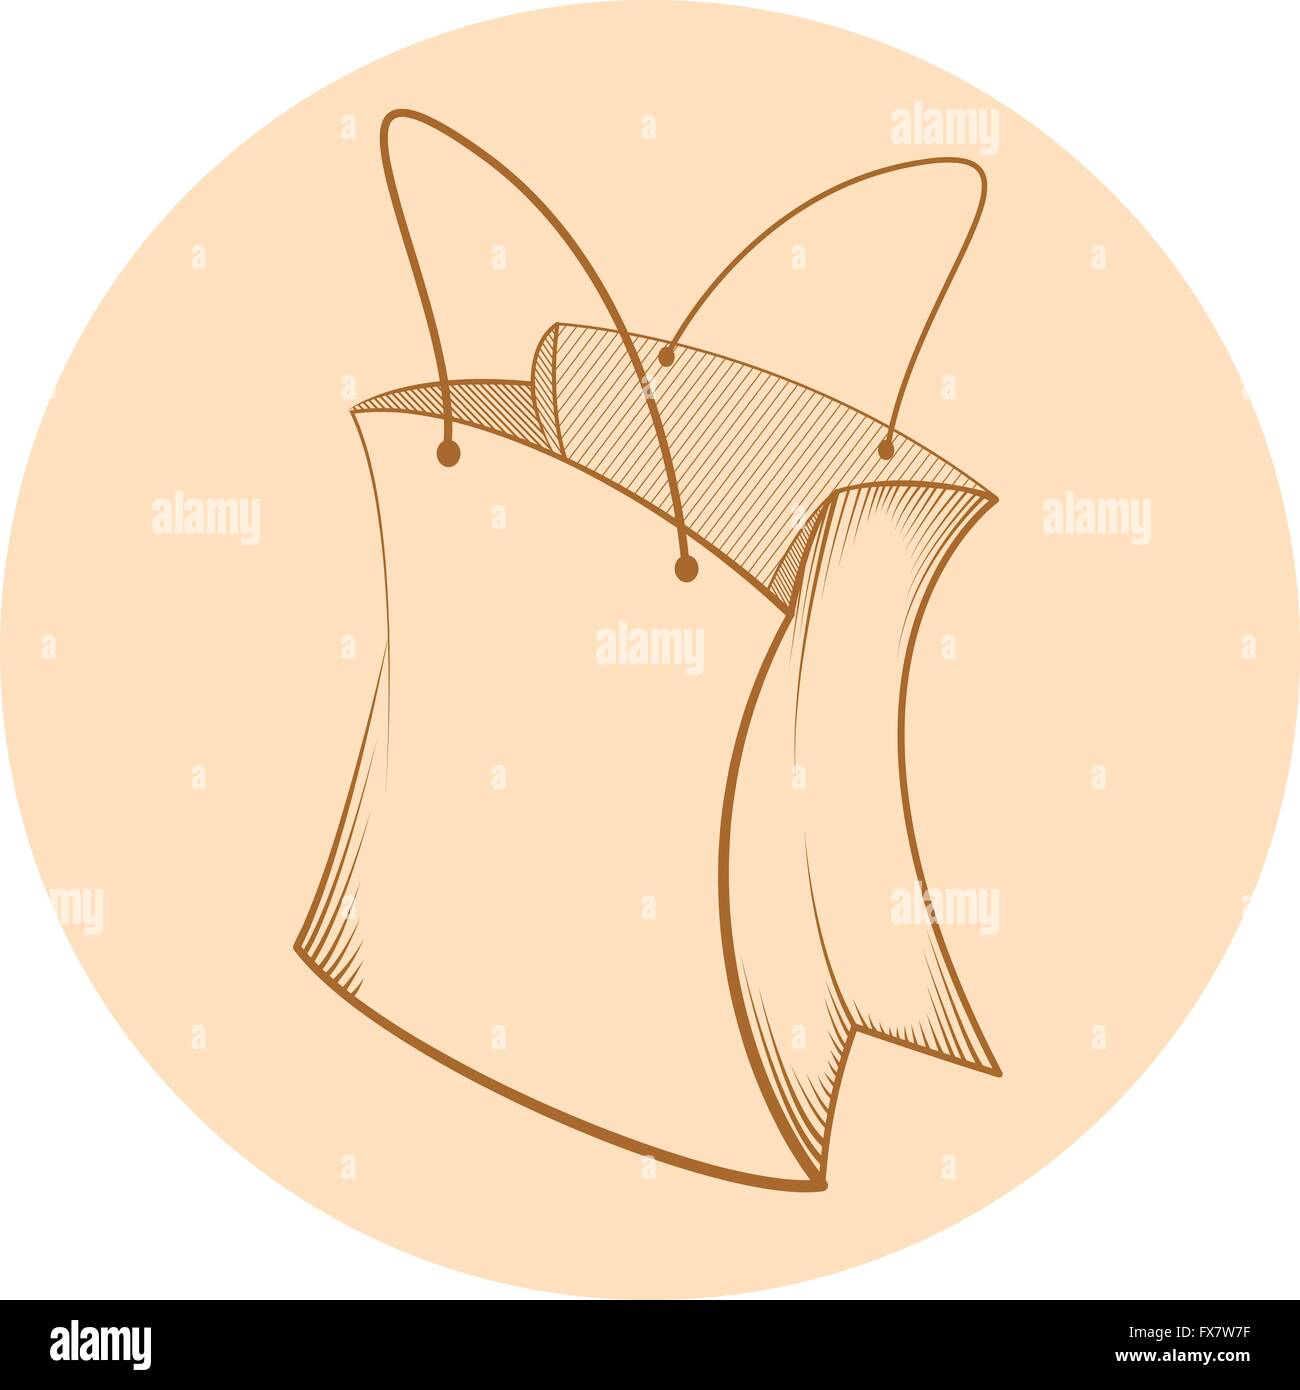 Paper bag sketch - Sketch Of Paper Bag